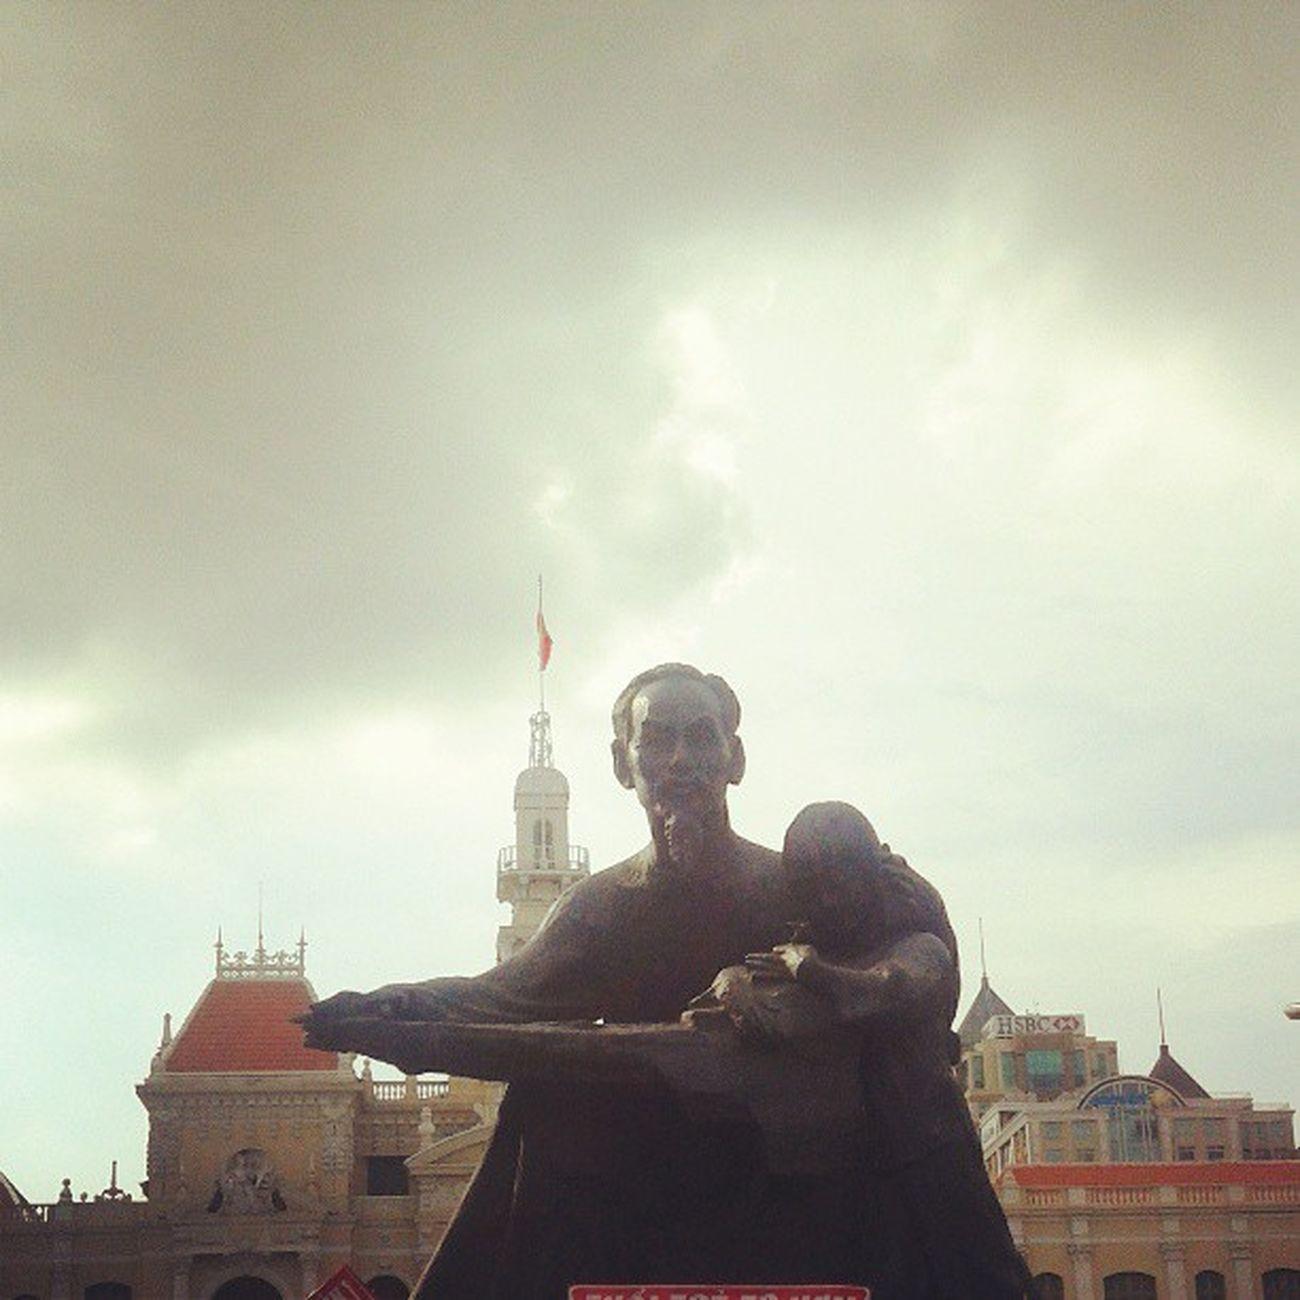 Mr. Ho Chi Minh Statue Leader Political City Landmark Landscape Instalandscape Instanusantara Instanusantarabali Instanesia Instagood Instadaily Igers Instapop IGDaily Sky Instasky Vietnam LangitbaliPhotoworks